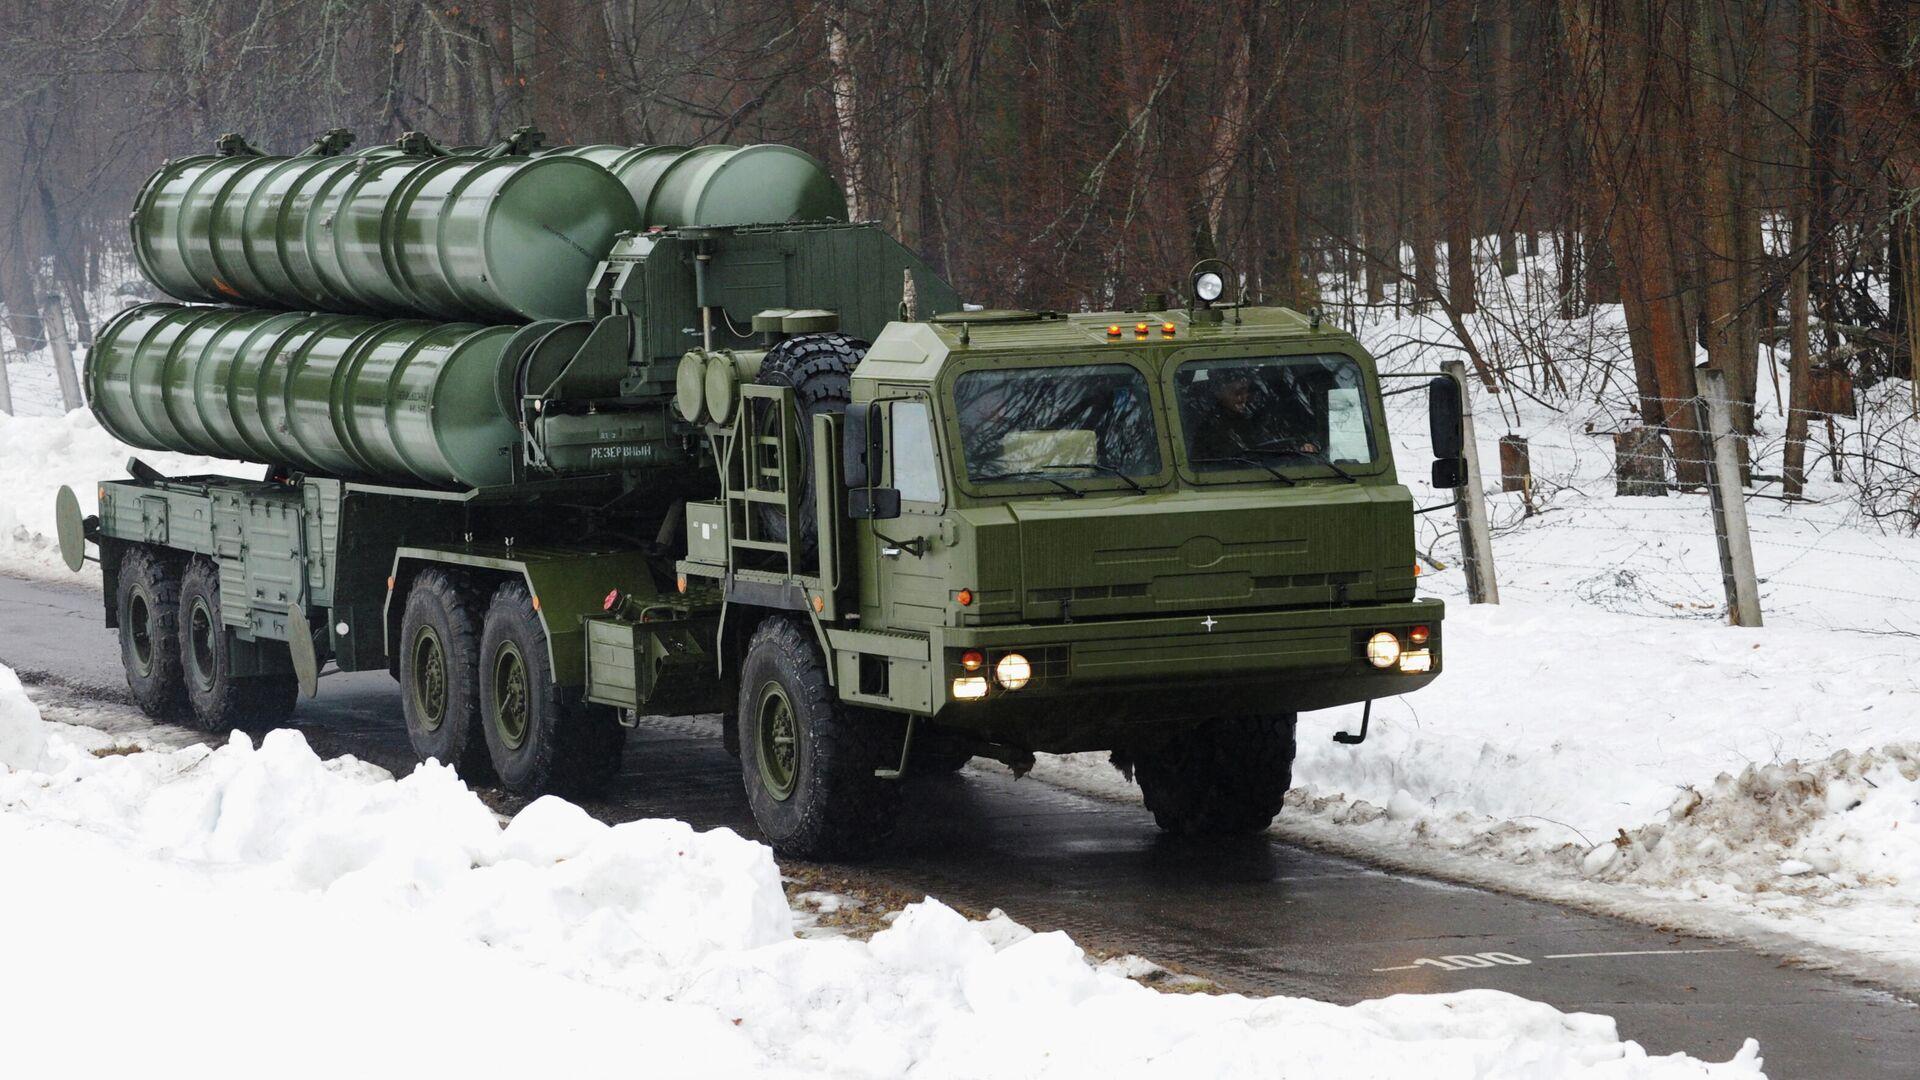 Пусковая установка зенитно-ракетного комплекса С-400 Триумф  - РИА Новости, 1920, 25.02.2021